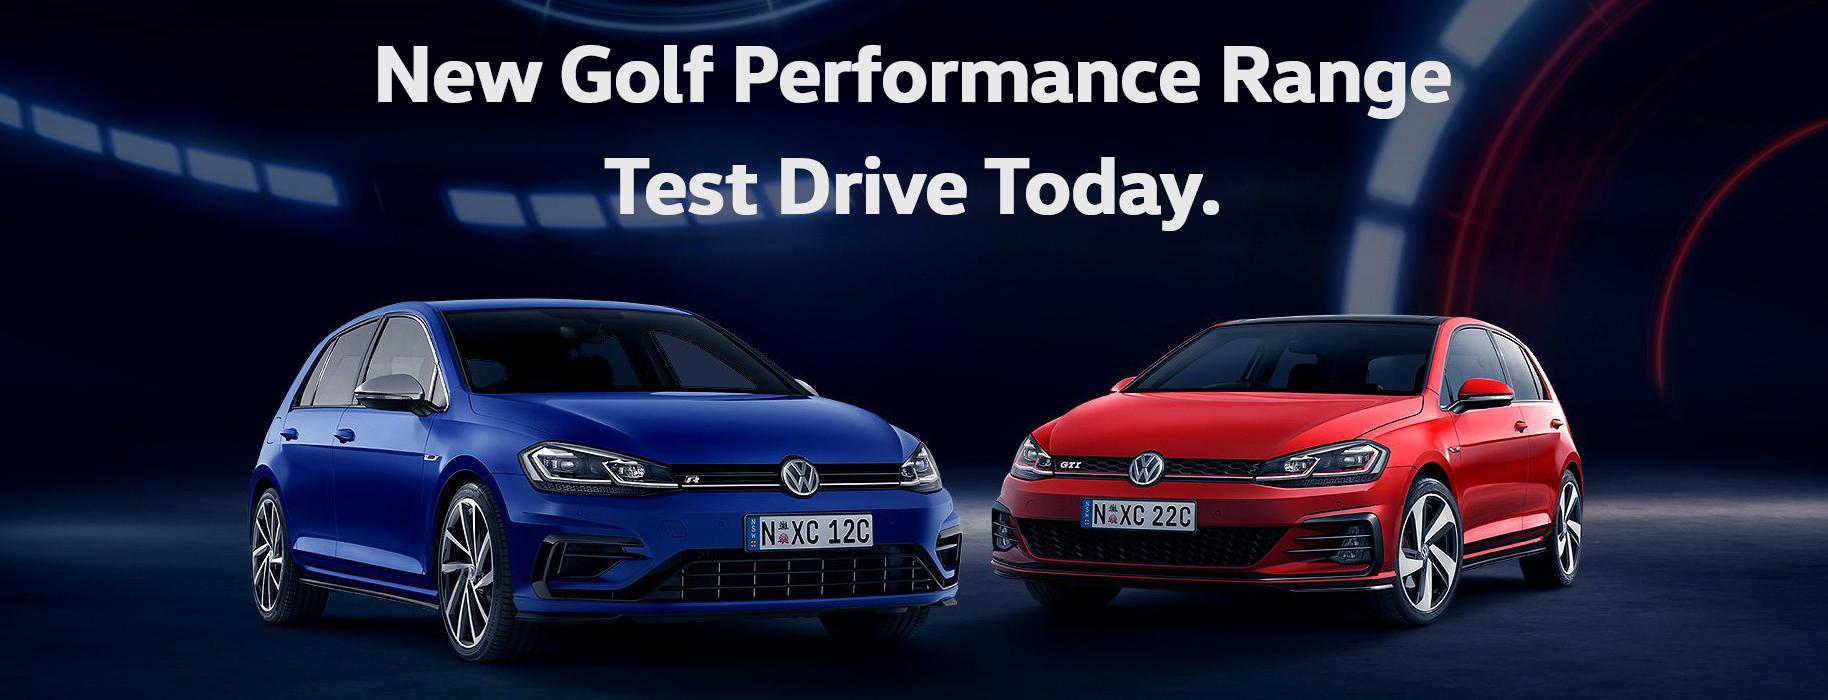 Golf Performance Test Drive